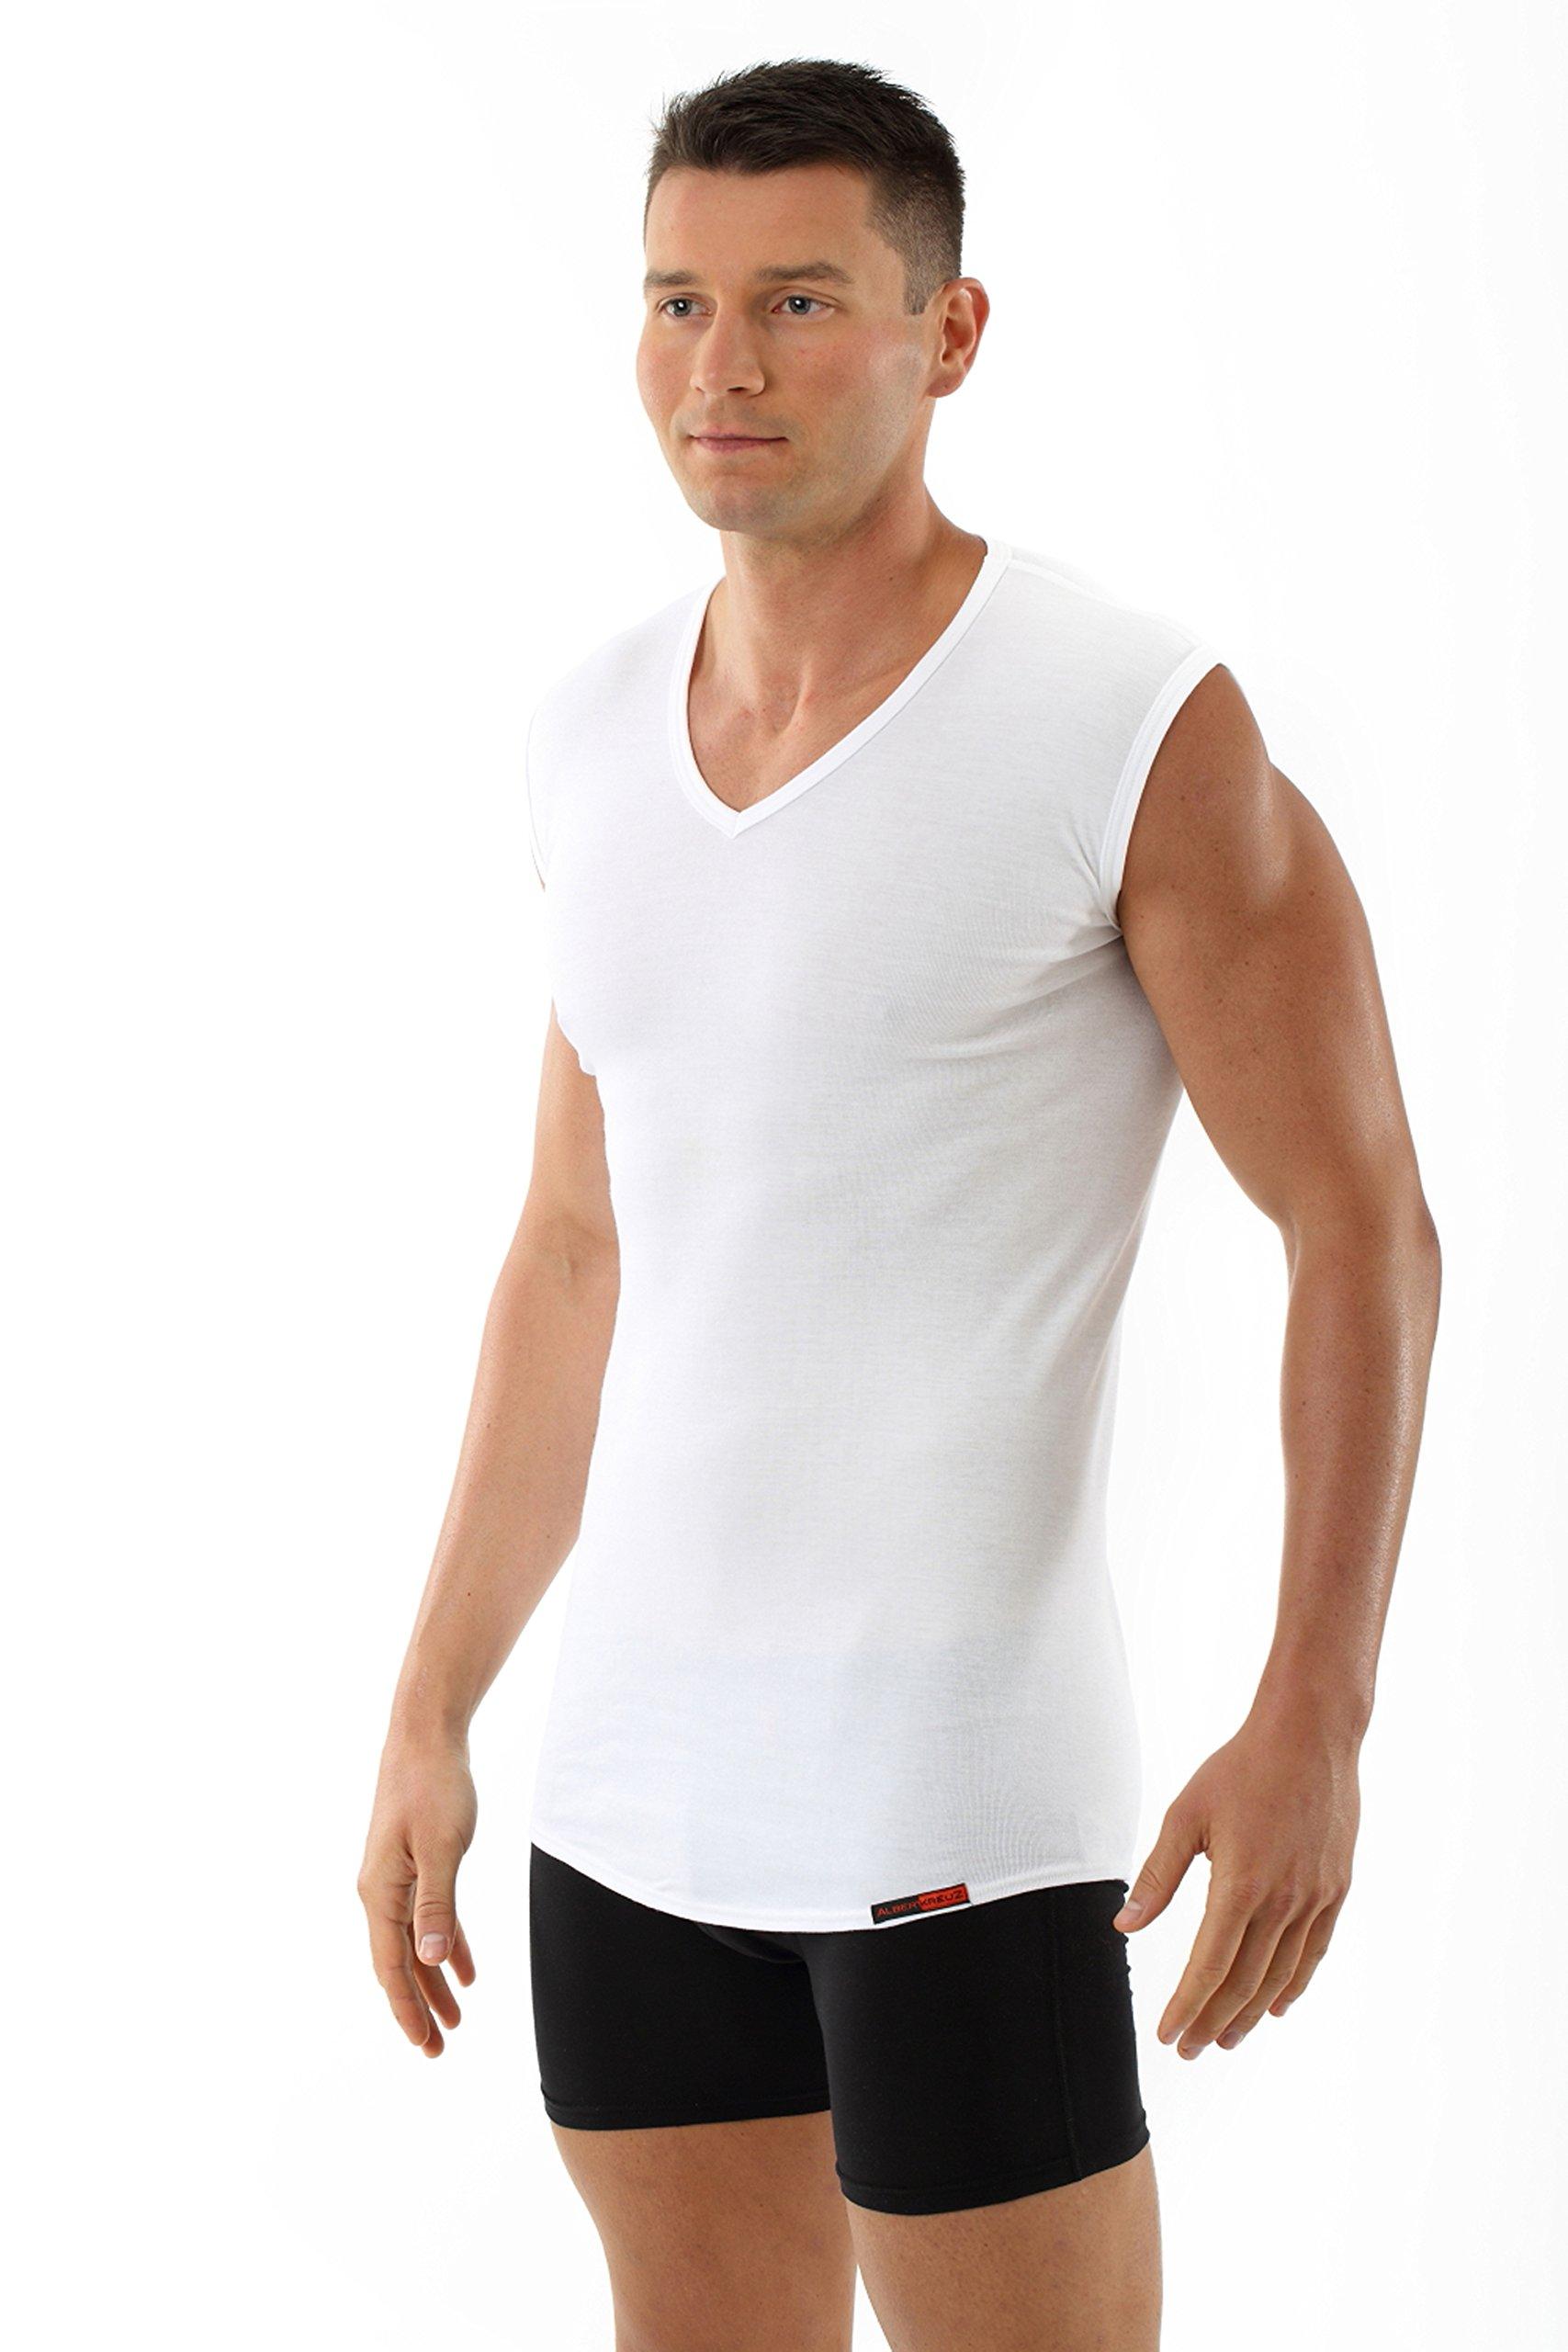 ALBERT KREUZ men's sleeveless V-neck business undershirt 100% organic cotton white M